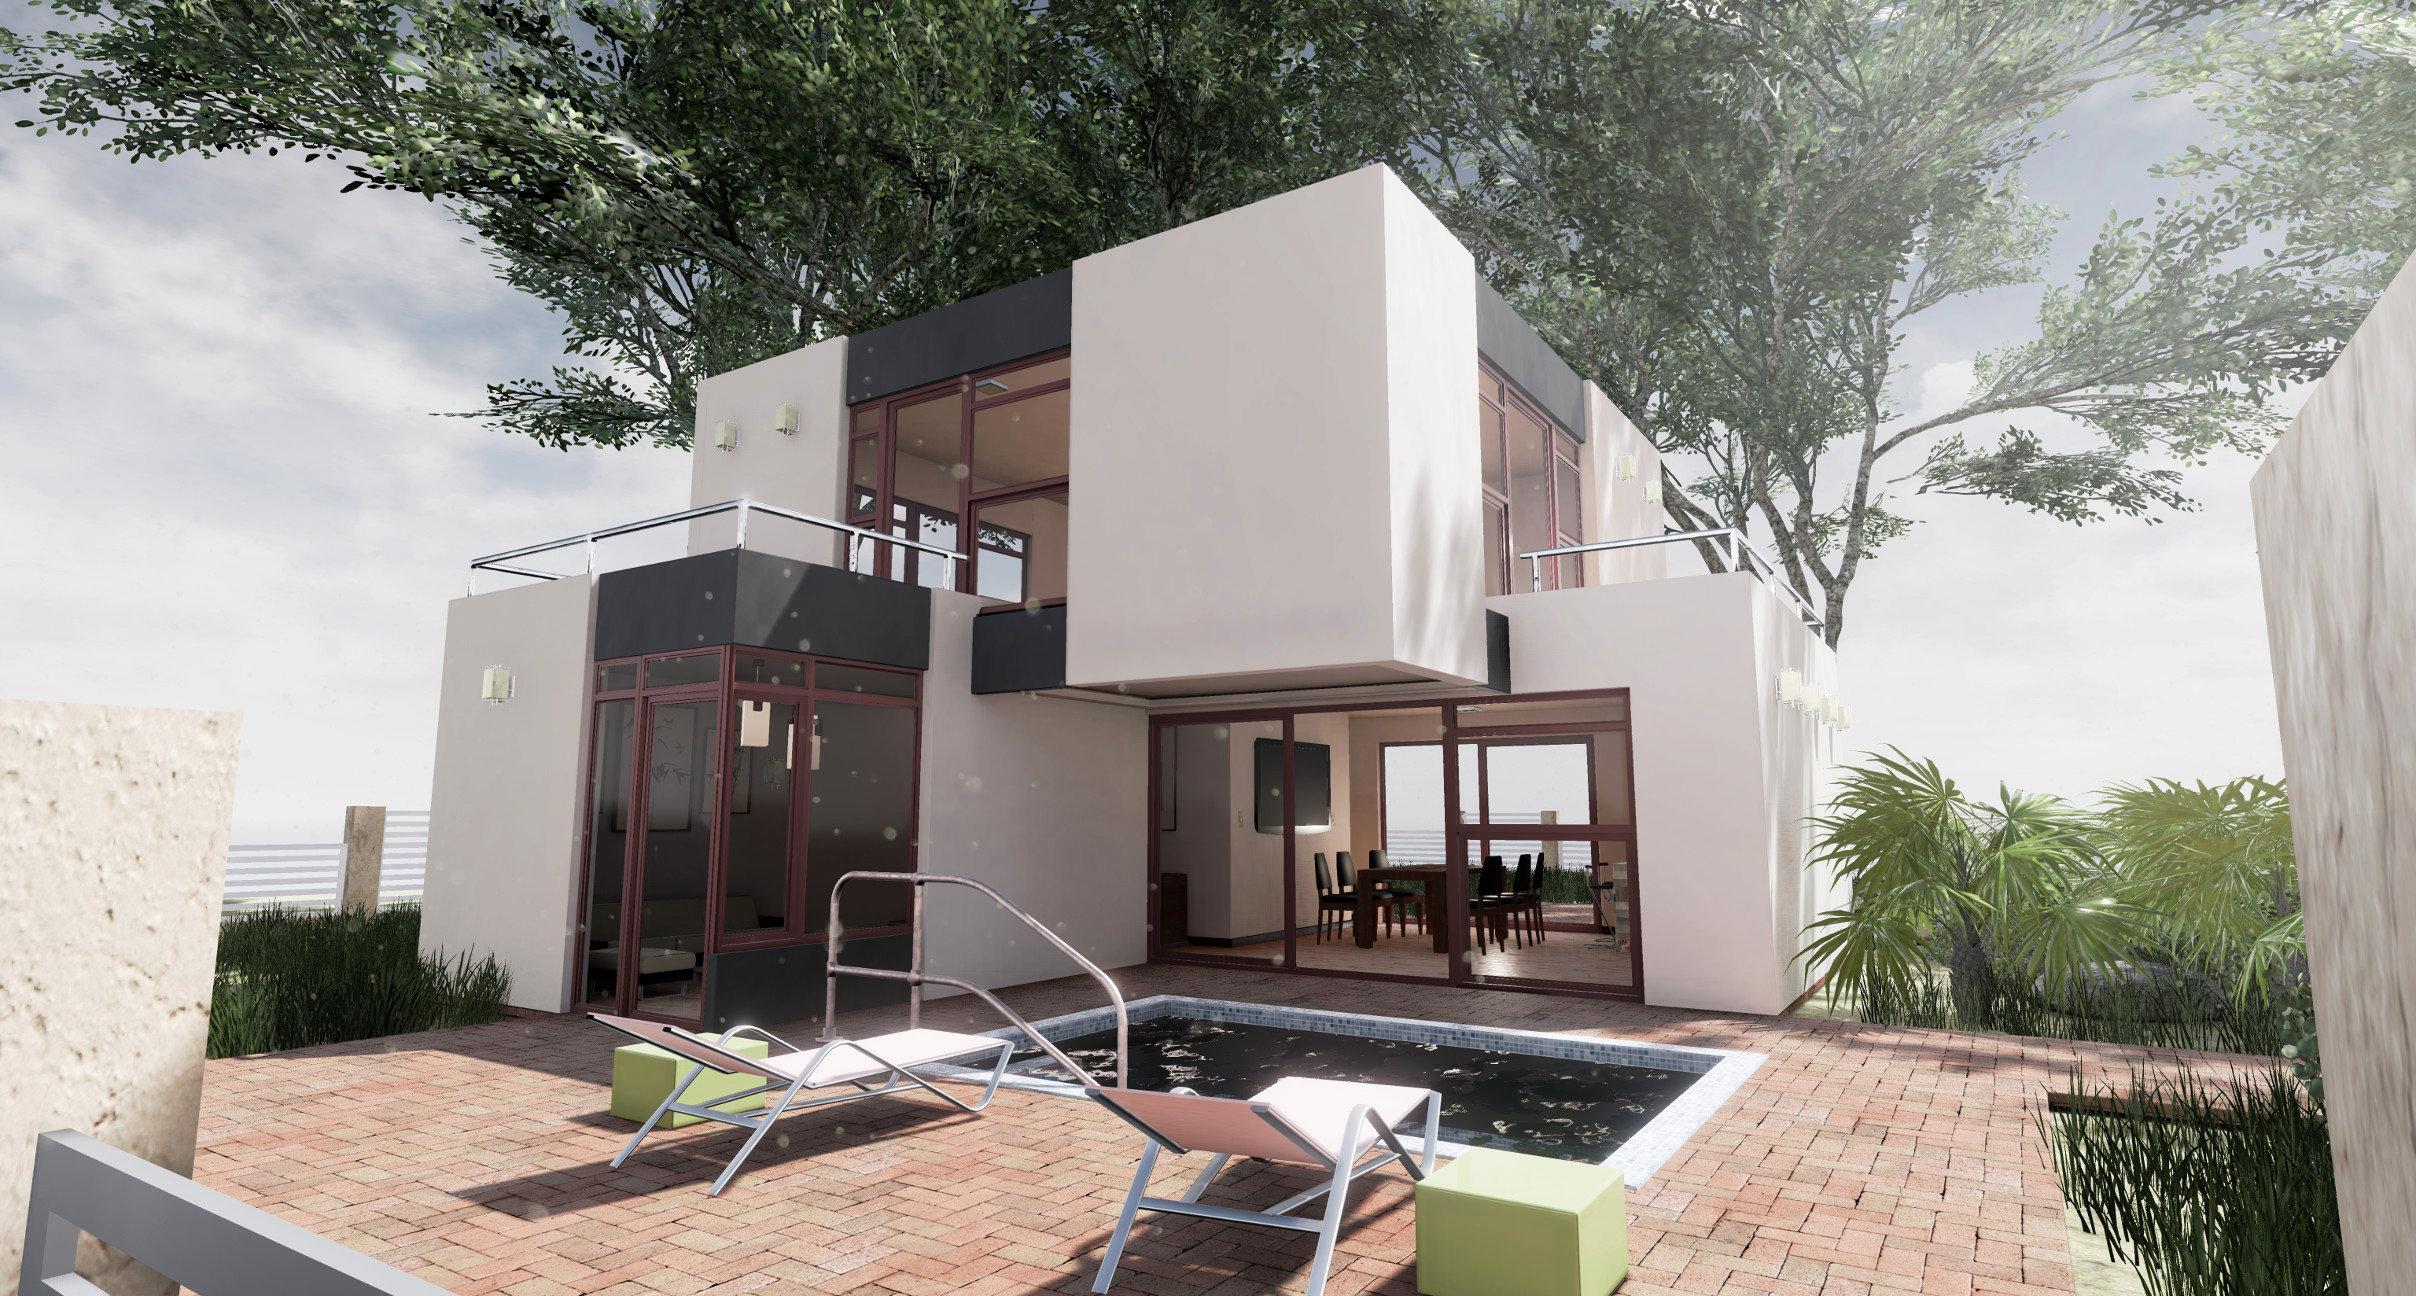 Casa minimalista blender ue4 for Casa minimalista 4 5x15